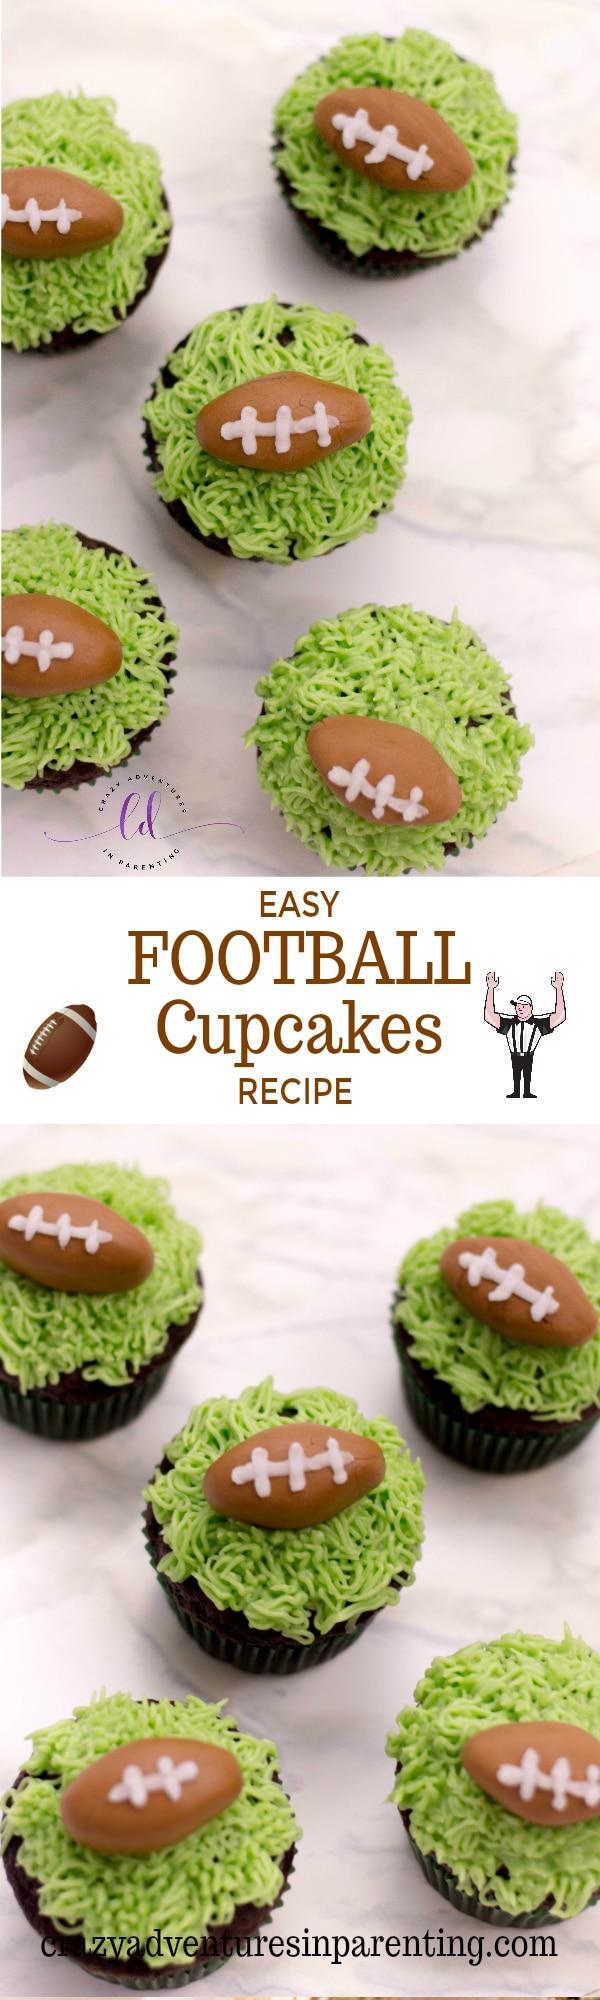 Easy Football Cupcakes Recipe